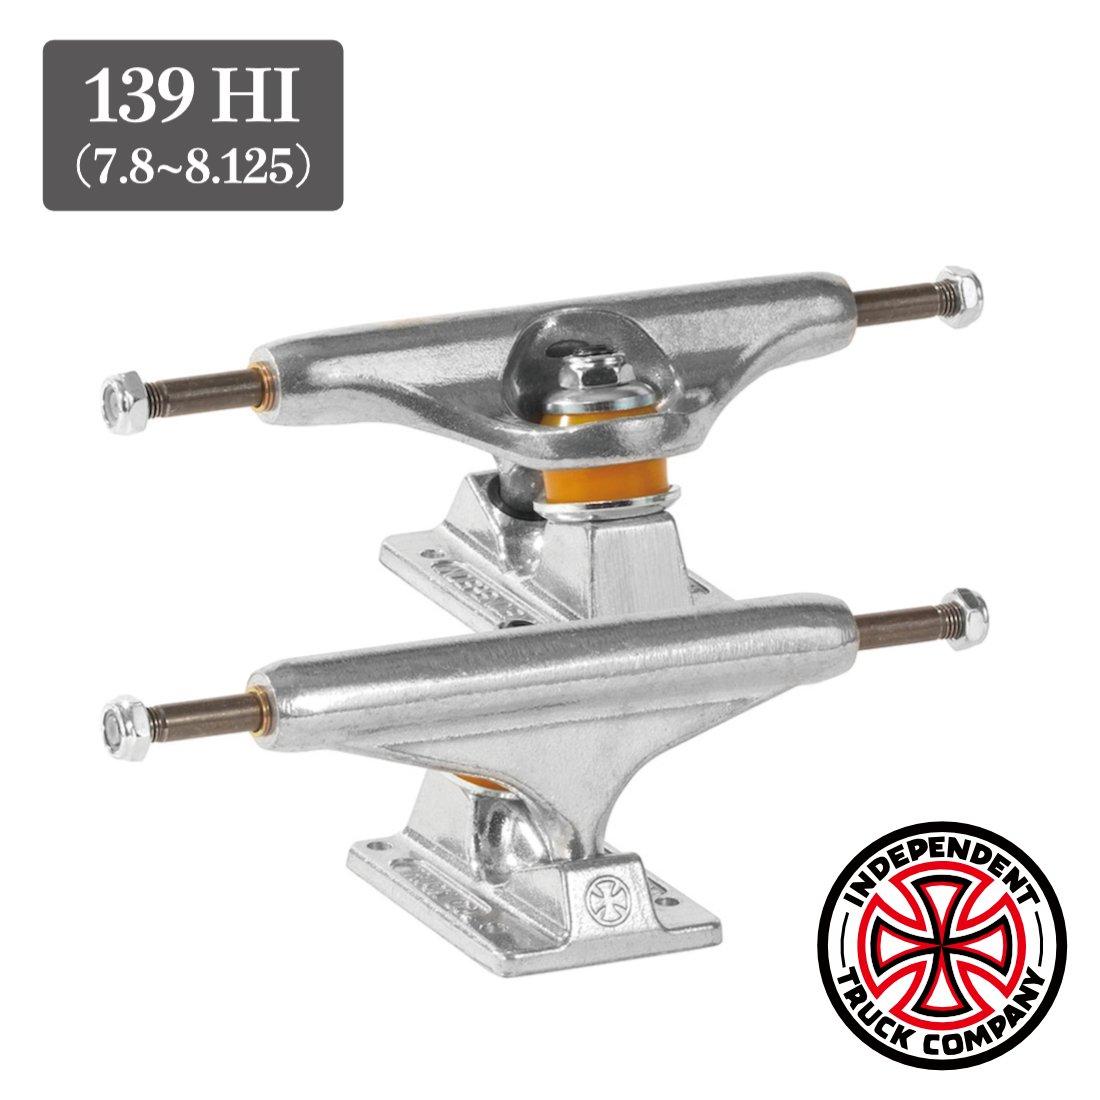 【INDEPENDENT】 Standard -139